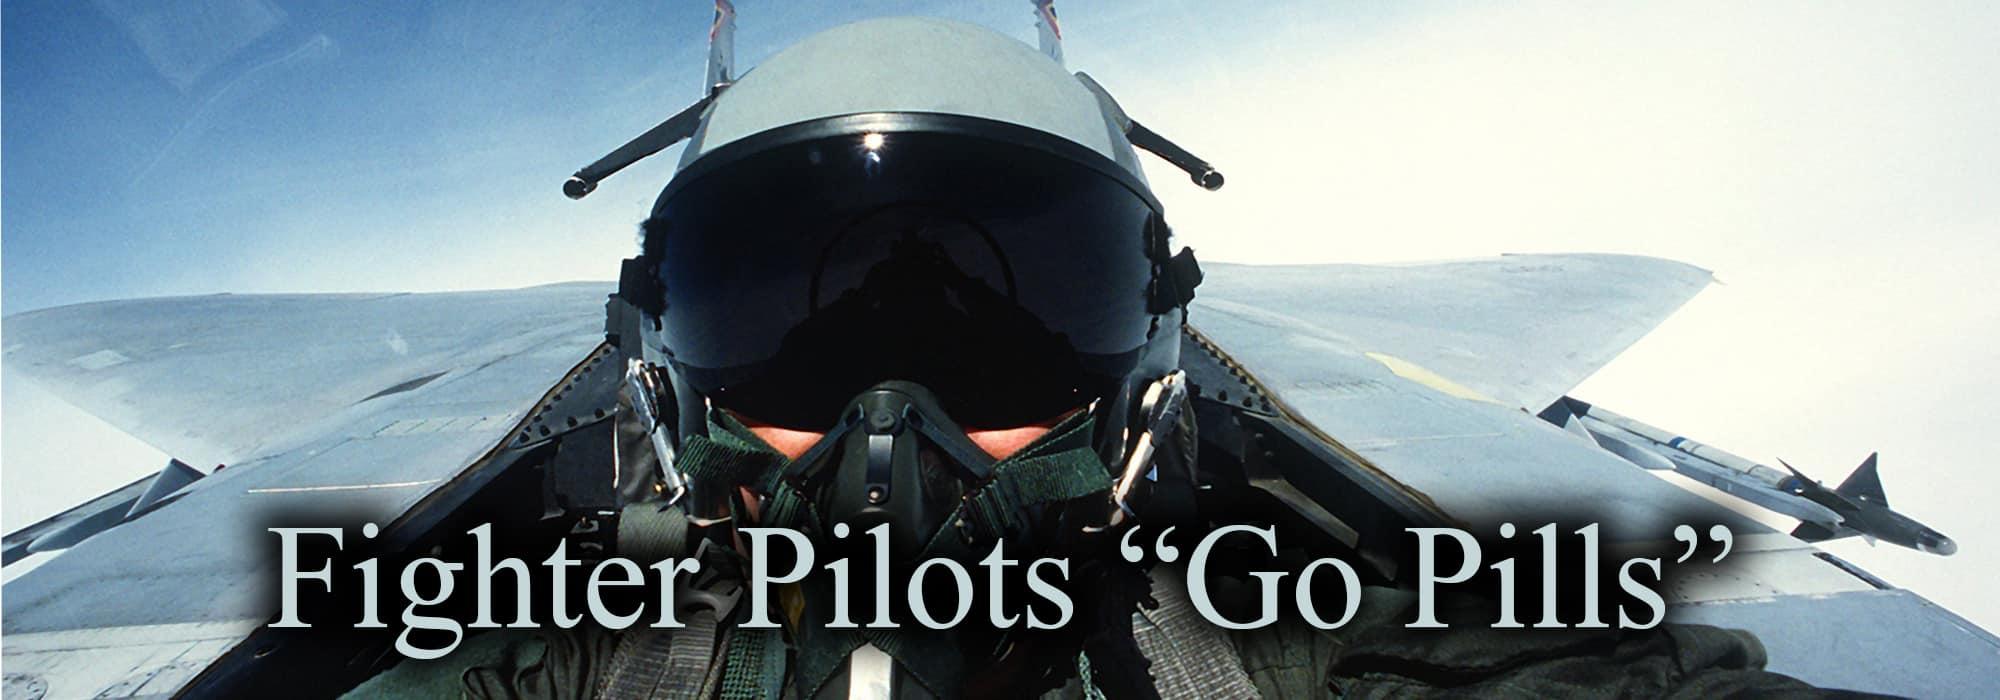 How Fighter Pilots Battle Fatigue